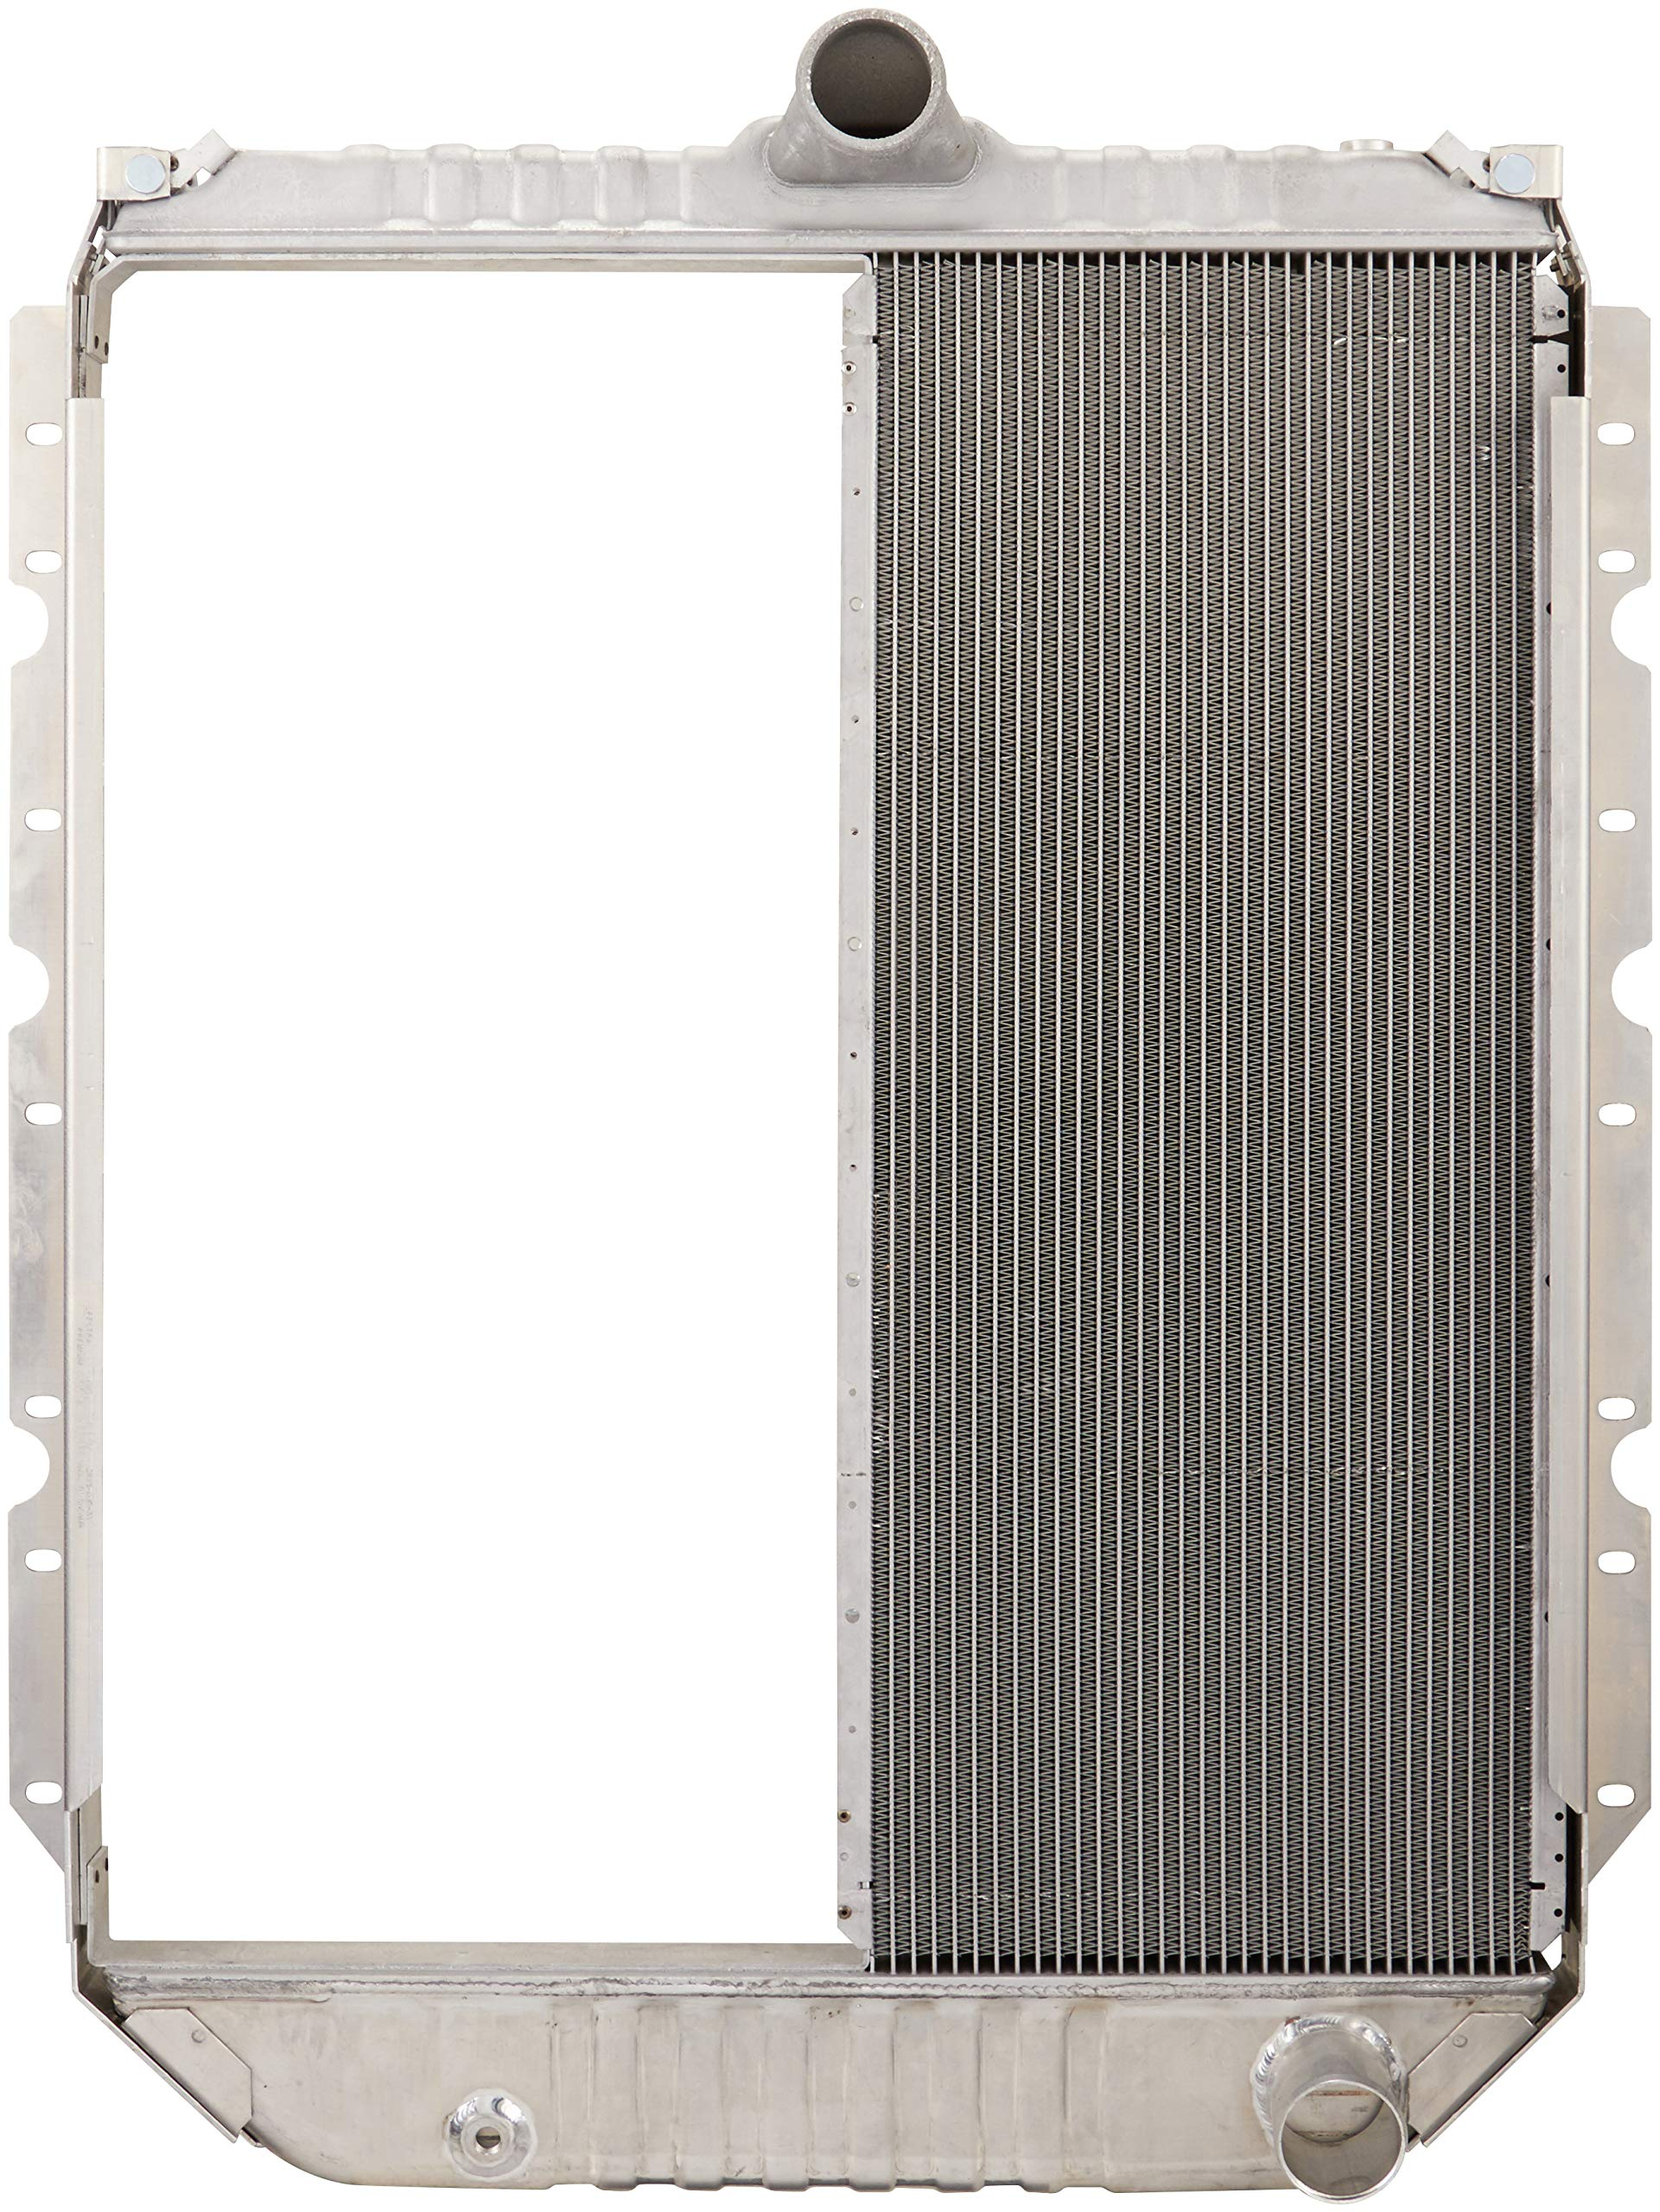 Spectra Premium 2006-3512A Industrial Complete Radiator by Spectra Premium